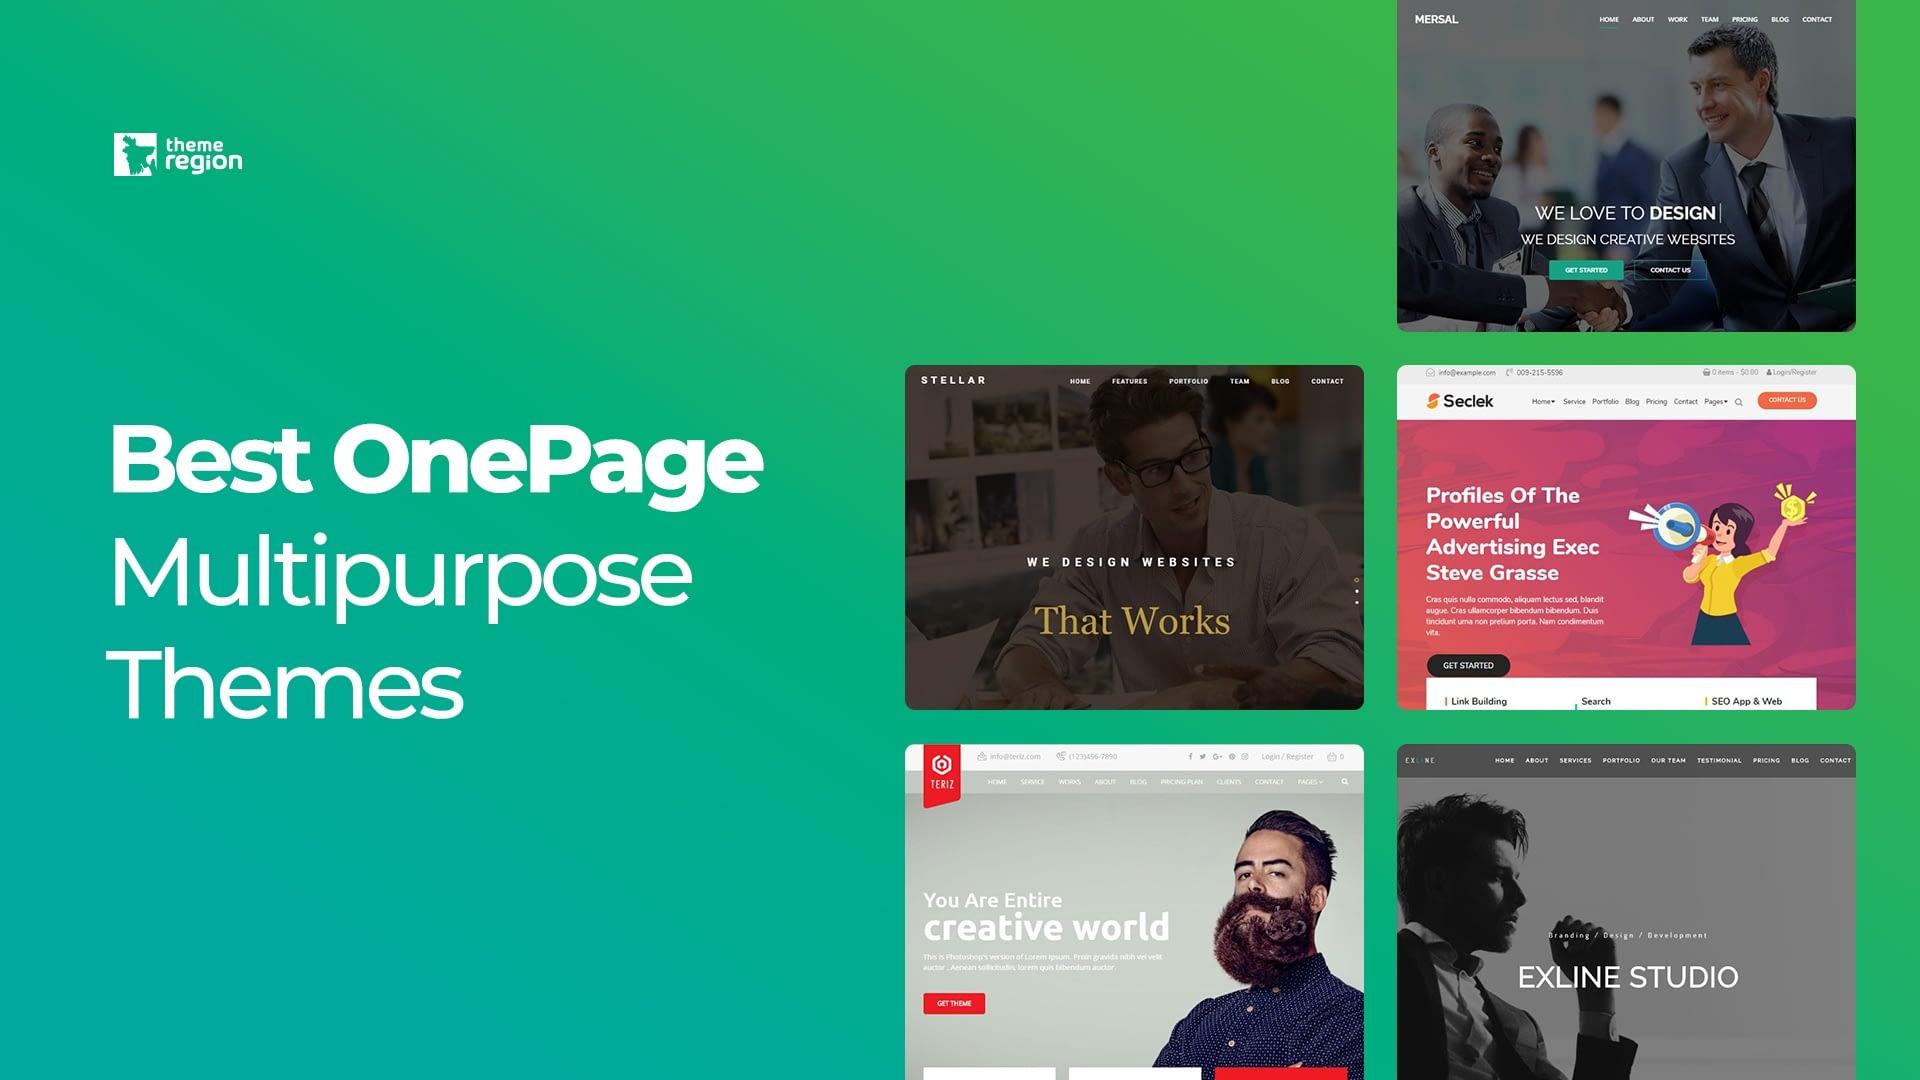 Best OnePage Multipurpose Themes for WordPress 2019